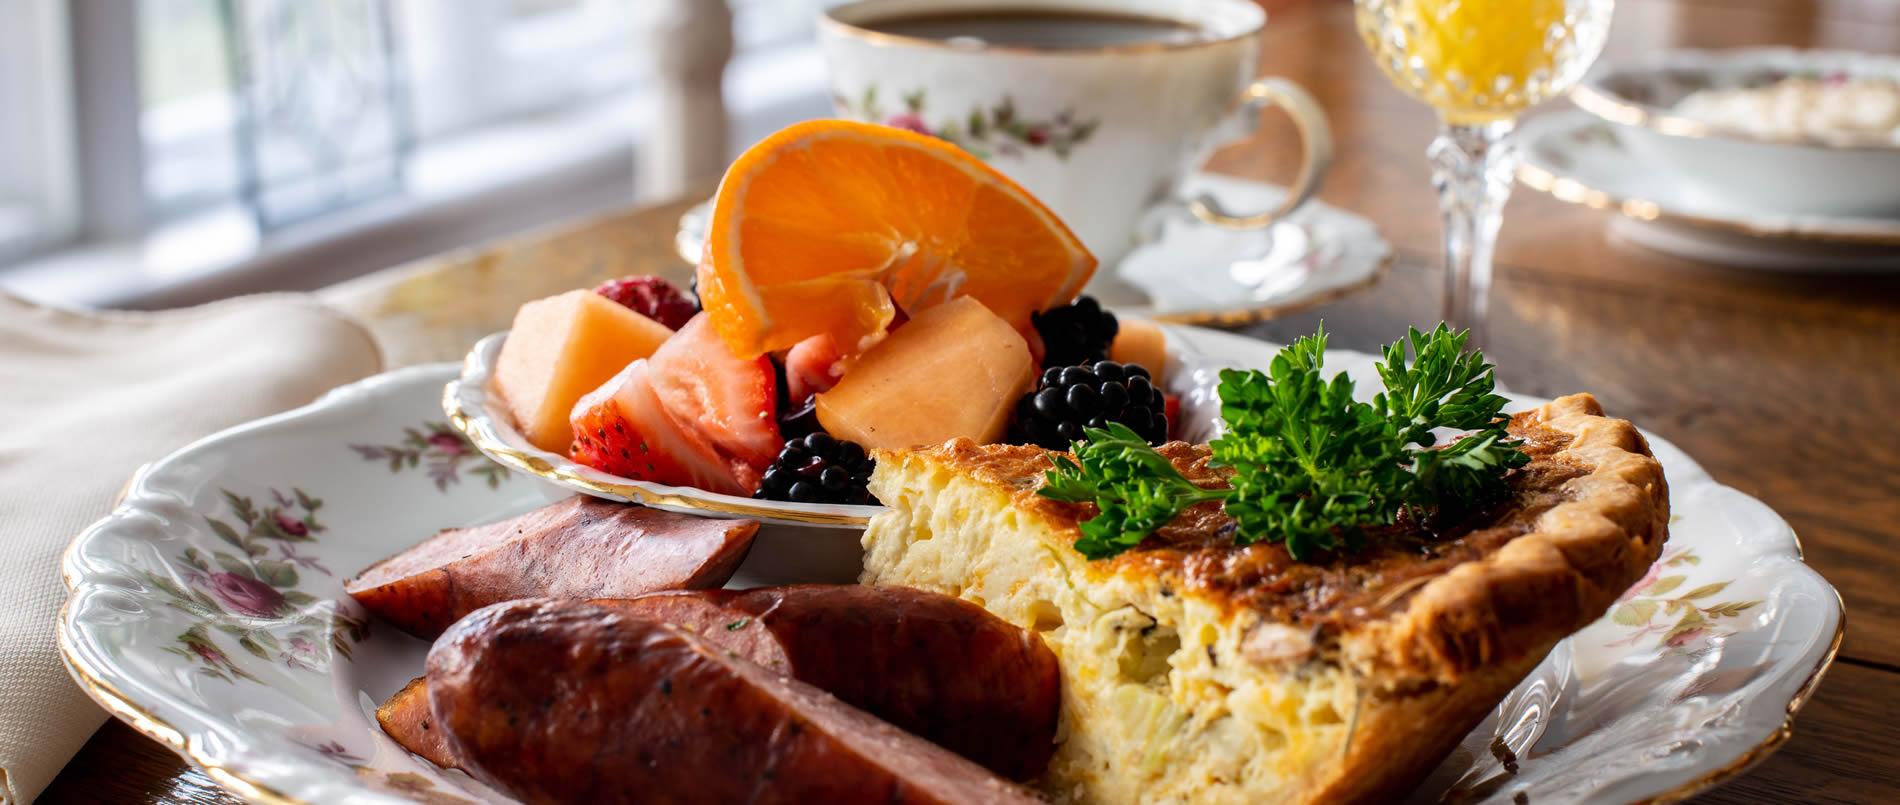 valparaiso inn bed and breakfast lodging breakfast